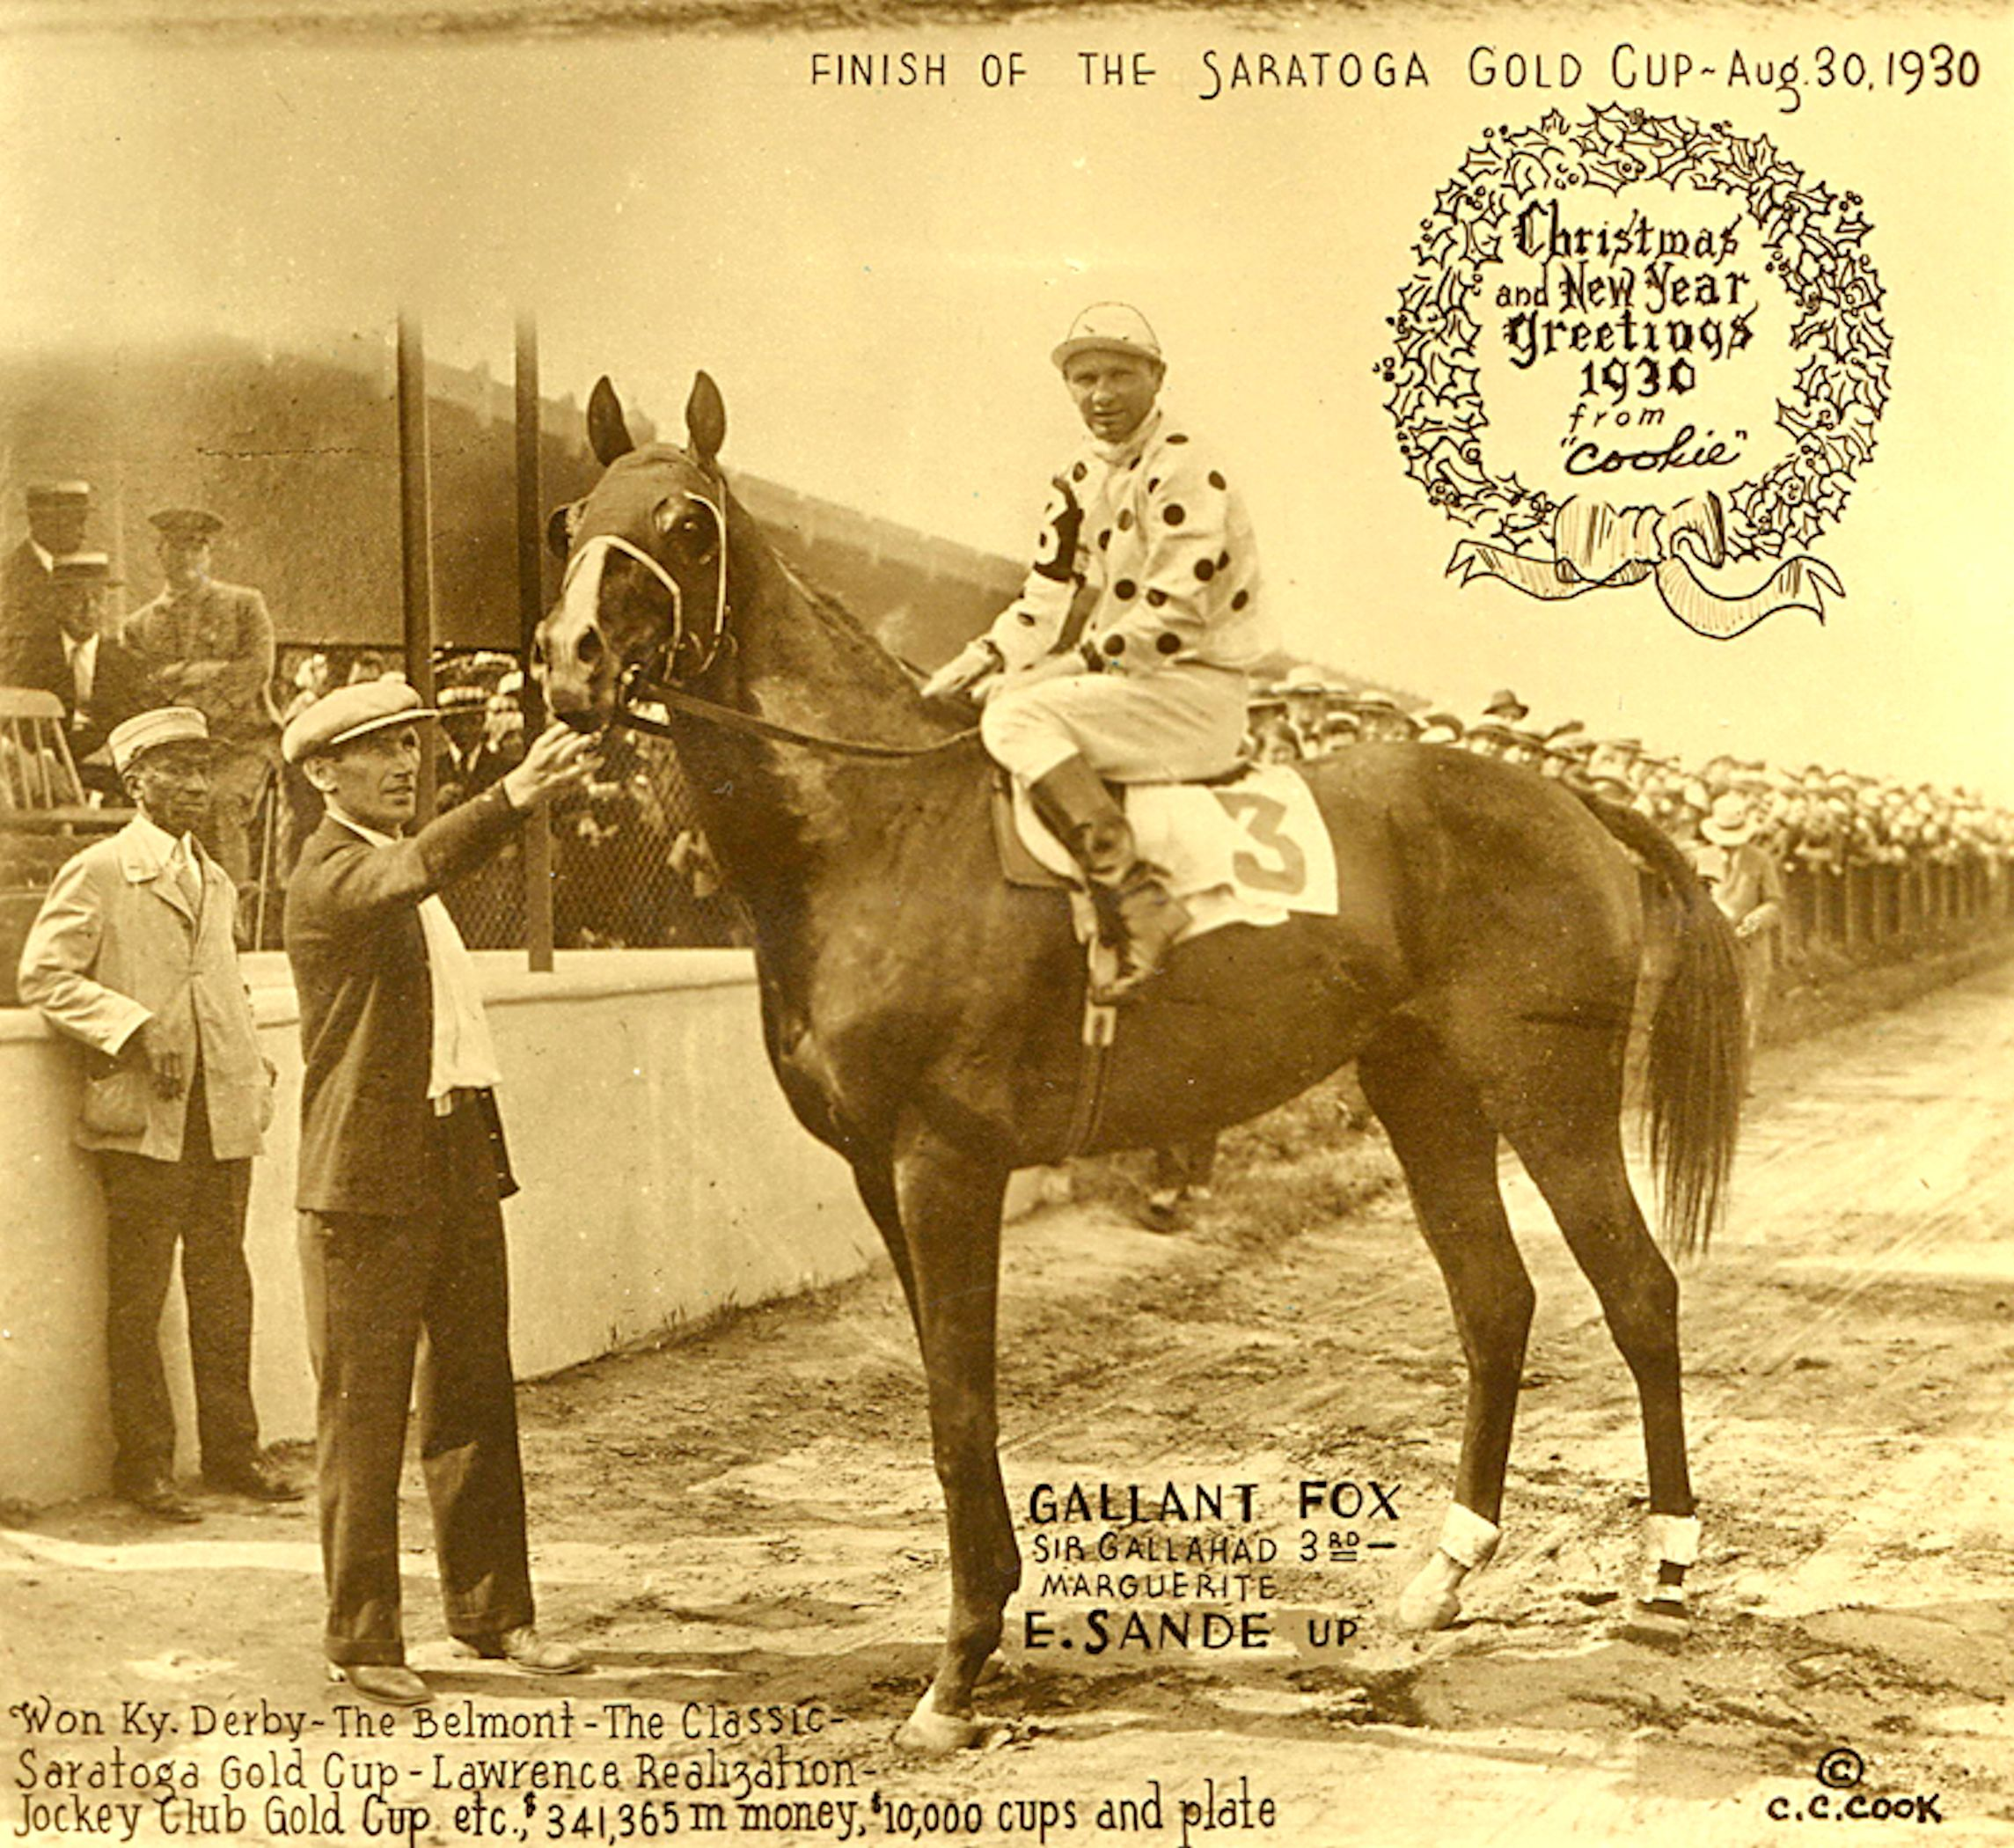 Earl Sande aboard Gallant Fox (C. C. Cook)